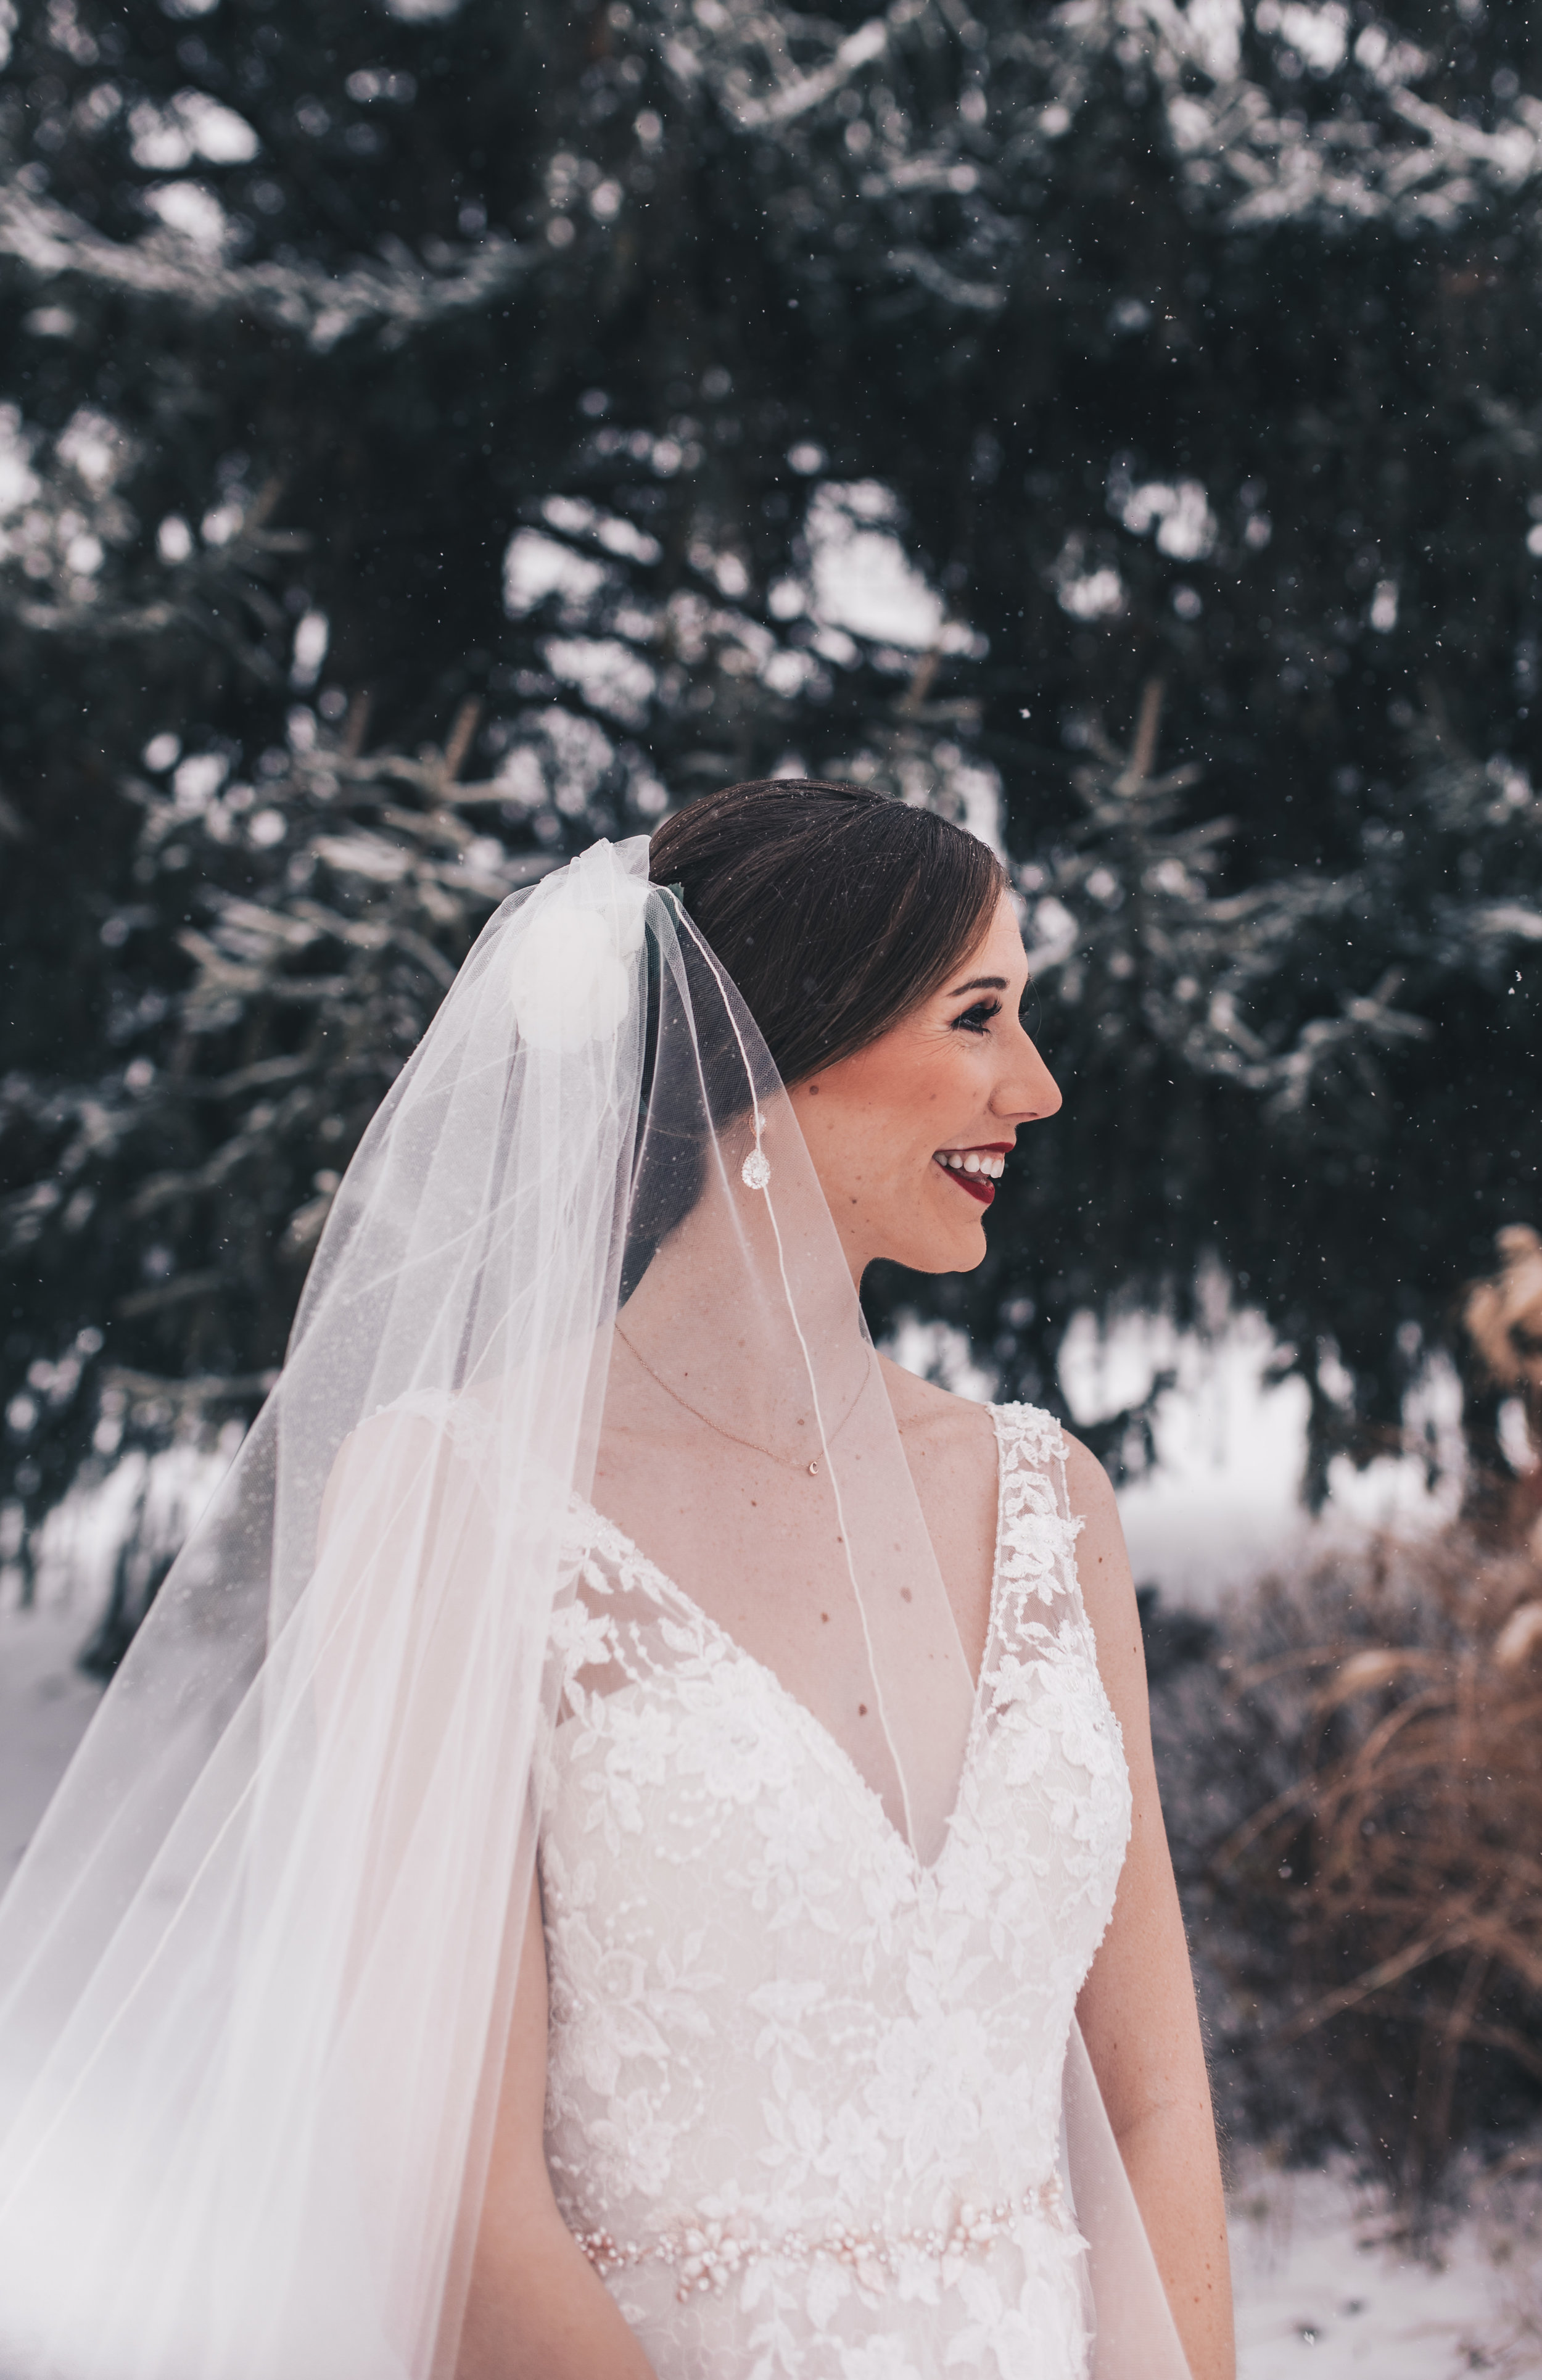 Winter Wedding, Chicago Winter Wedding, Chicago Wedding Photographer, Illinois Wedding, Illinois Wedding Photographer, Classy Modern Wedding, First Look Photos, Bride And Groom Photos